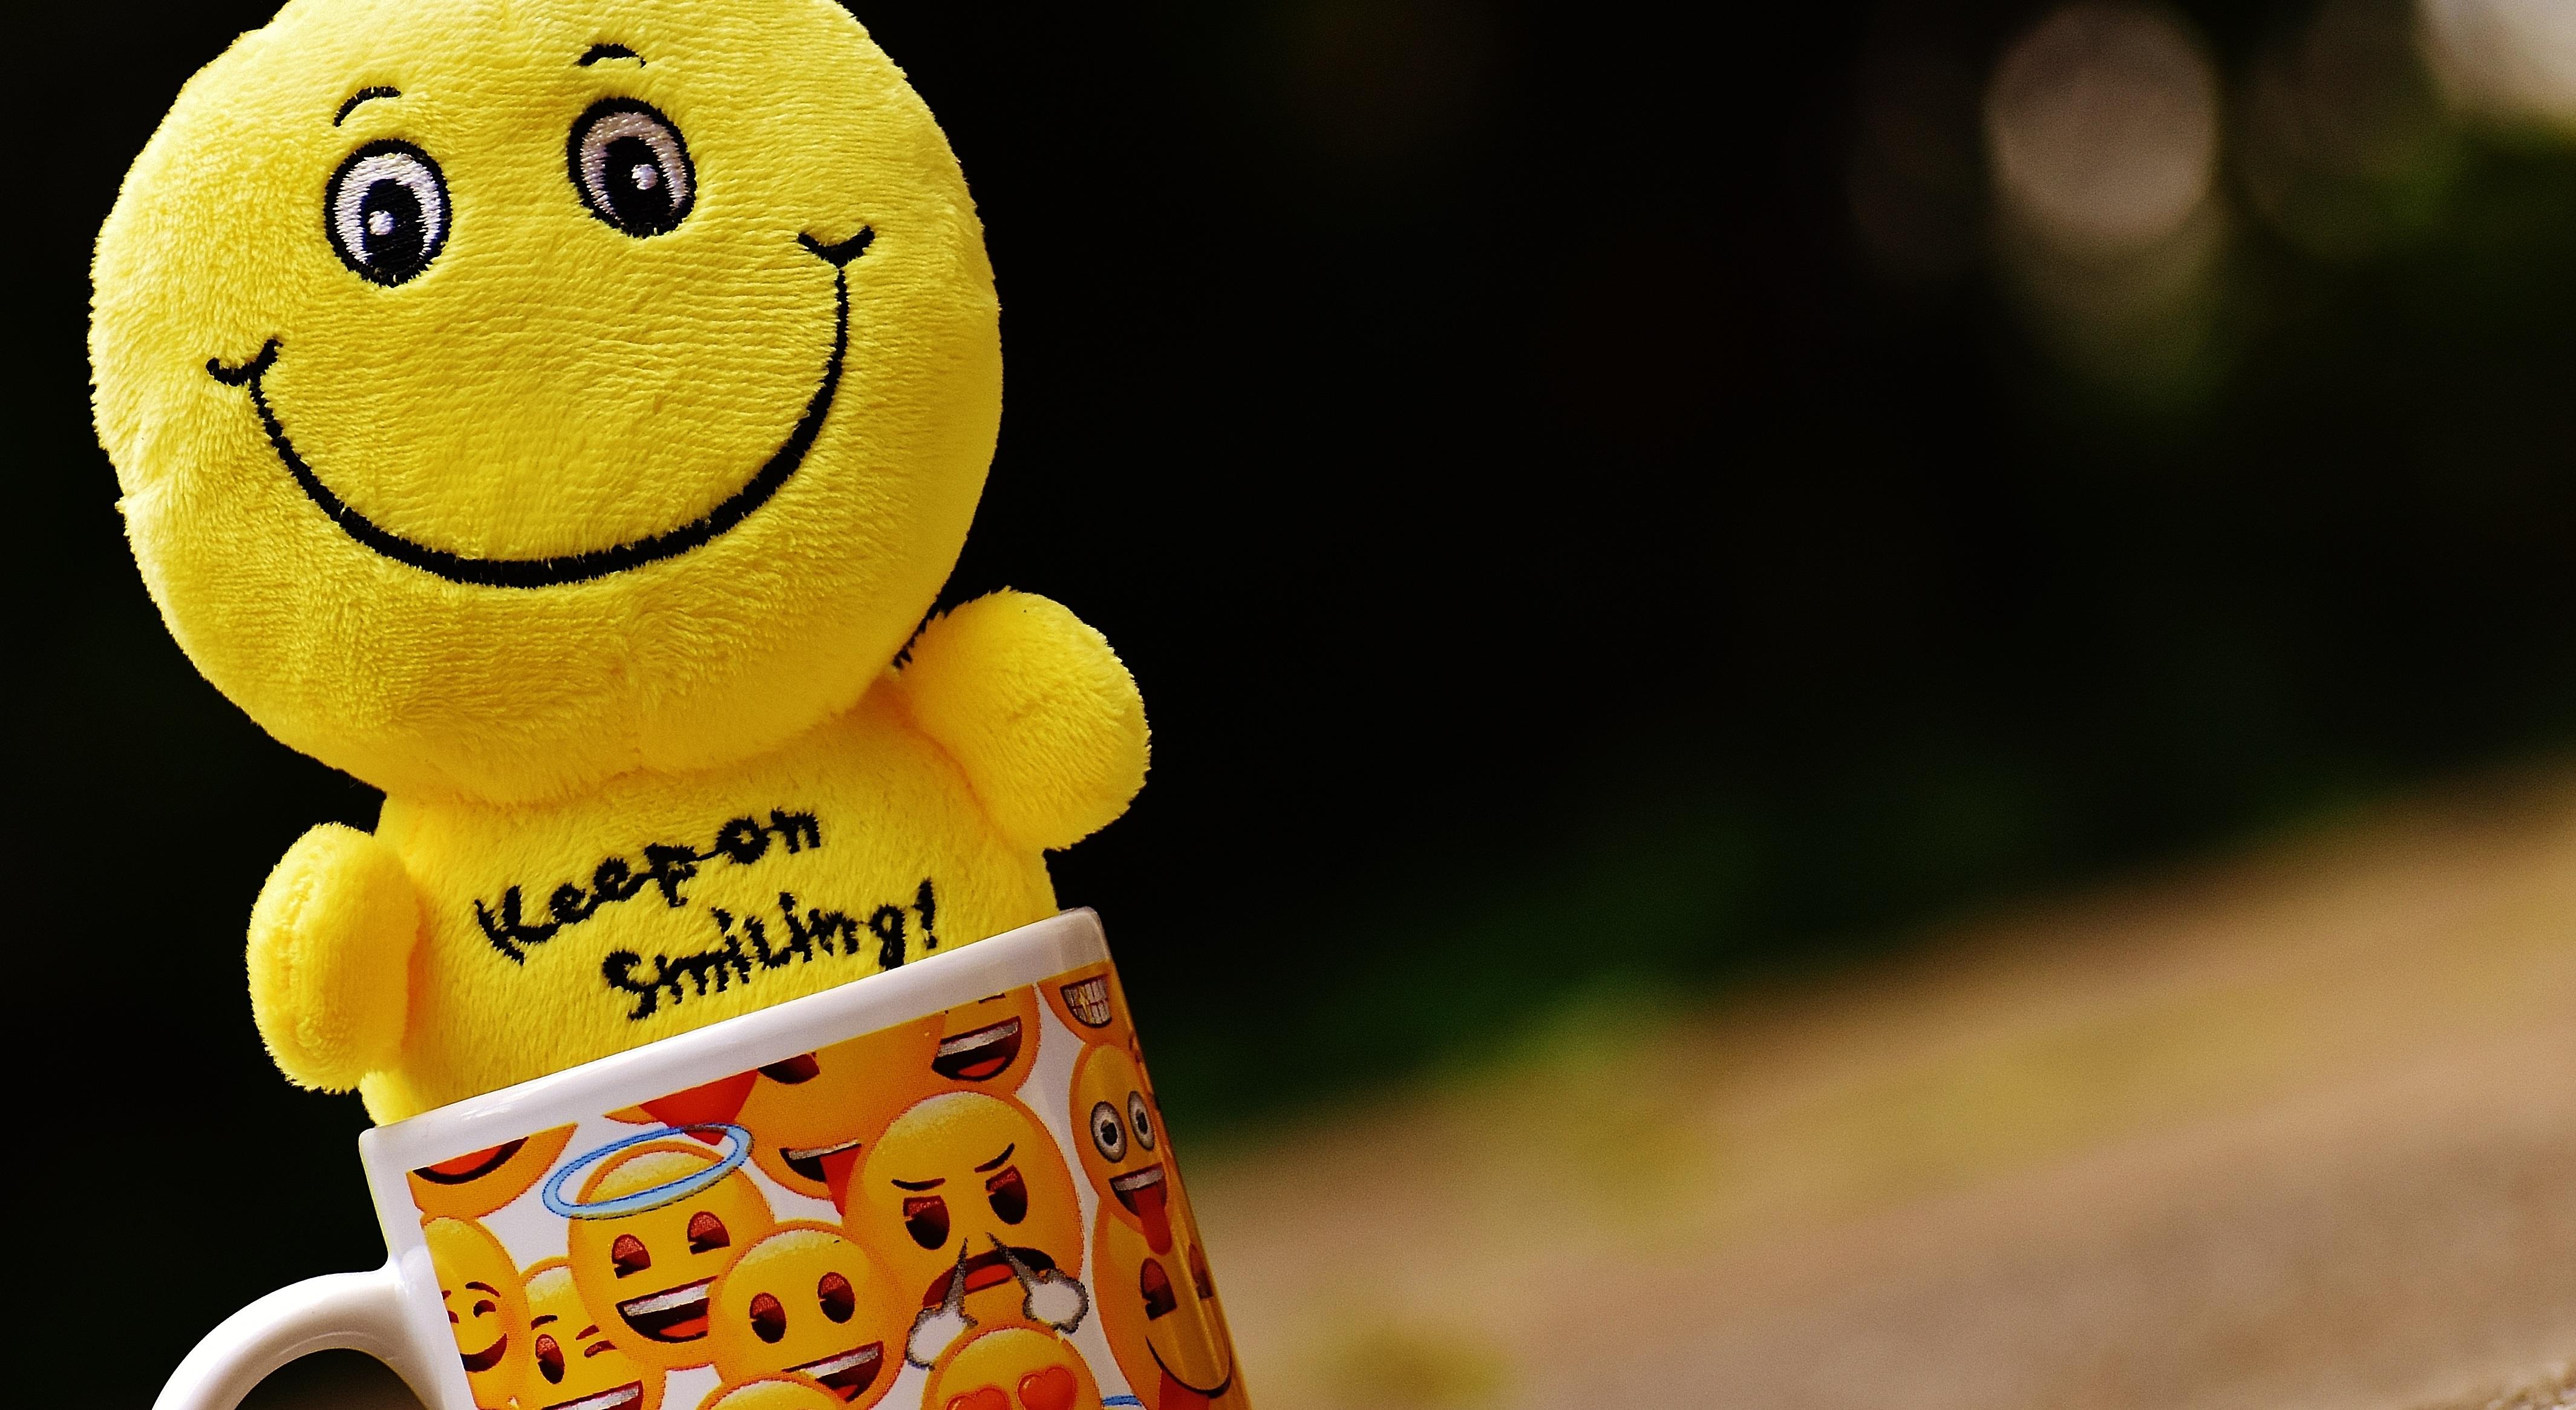 Gambar Cangkir Warna Kuning Mainan Tersenyum Tertawa